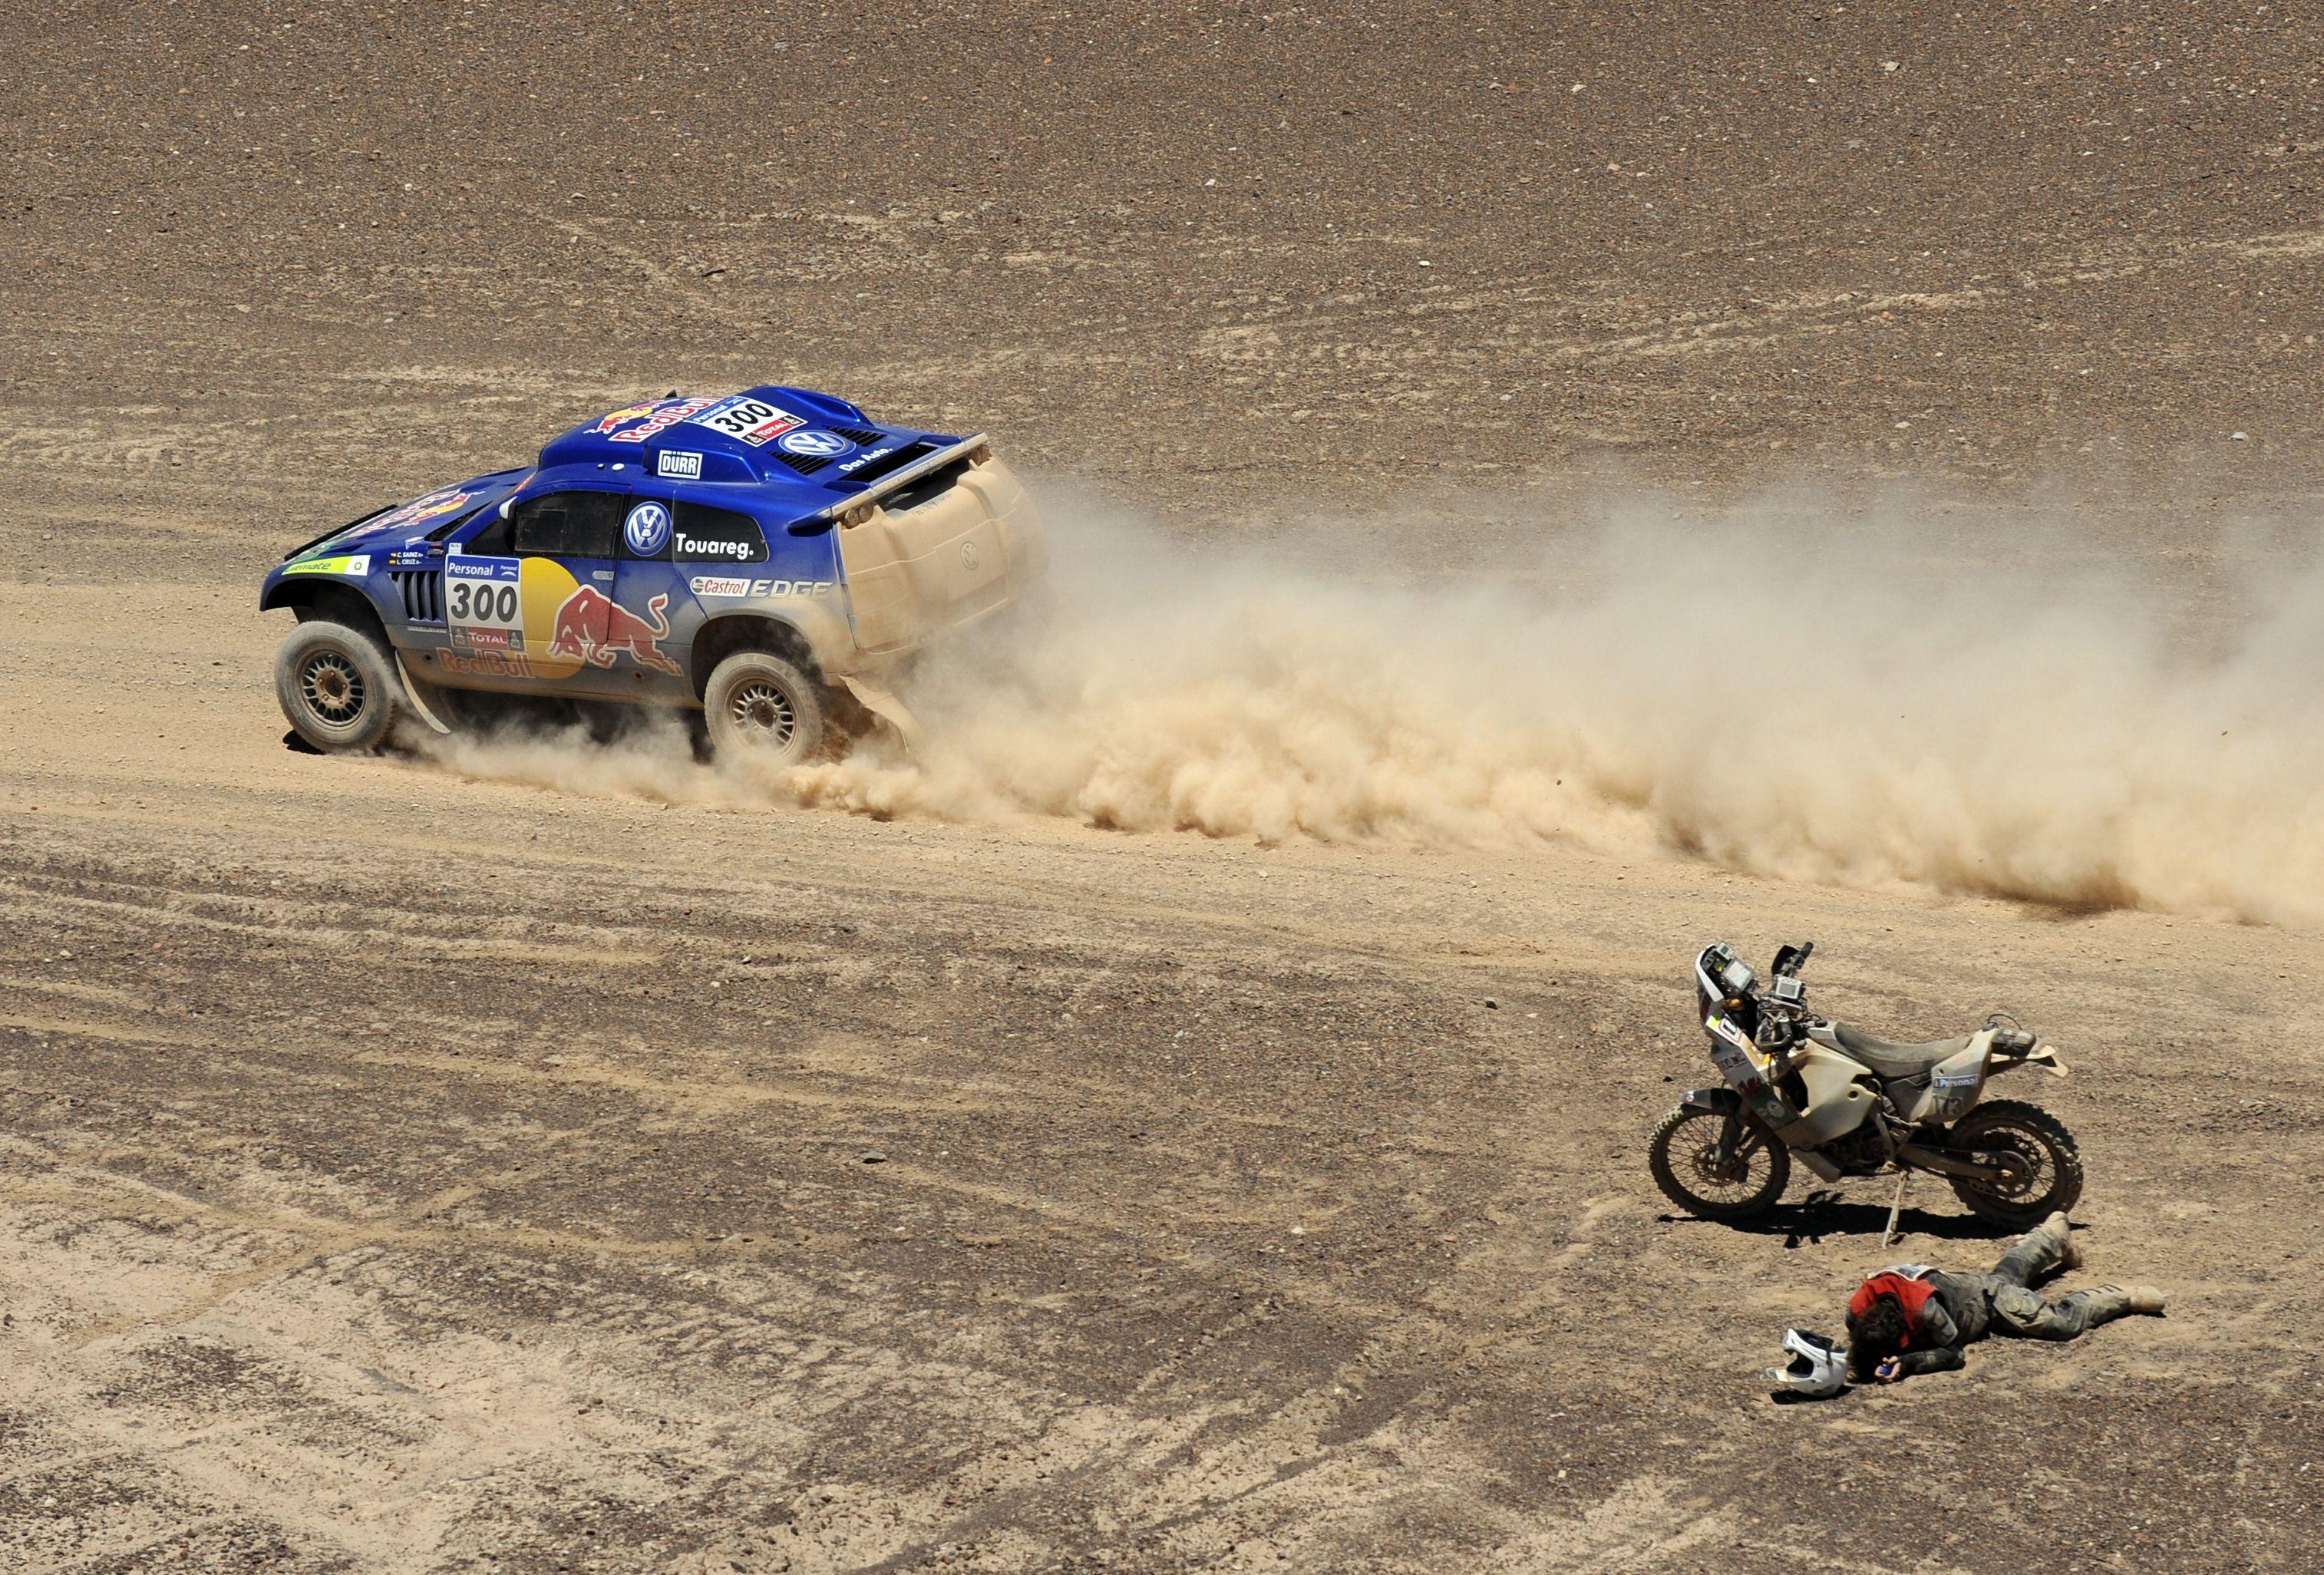 спорт мотоцикл гонка sports motorcycle race  № 3296405 без смс